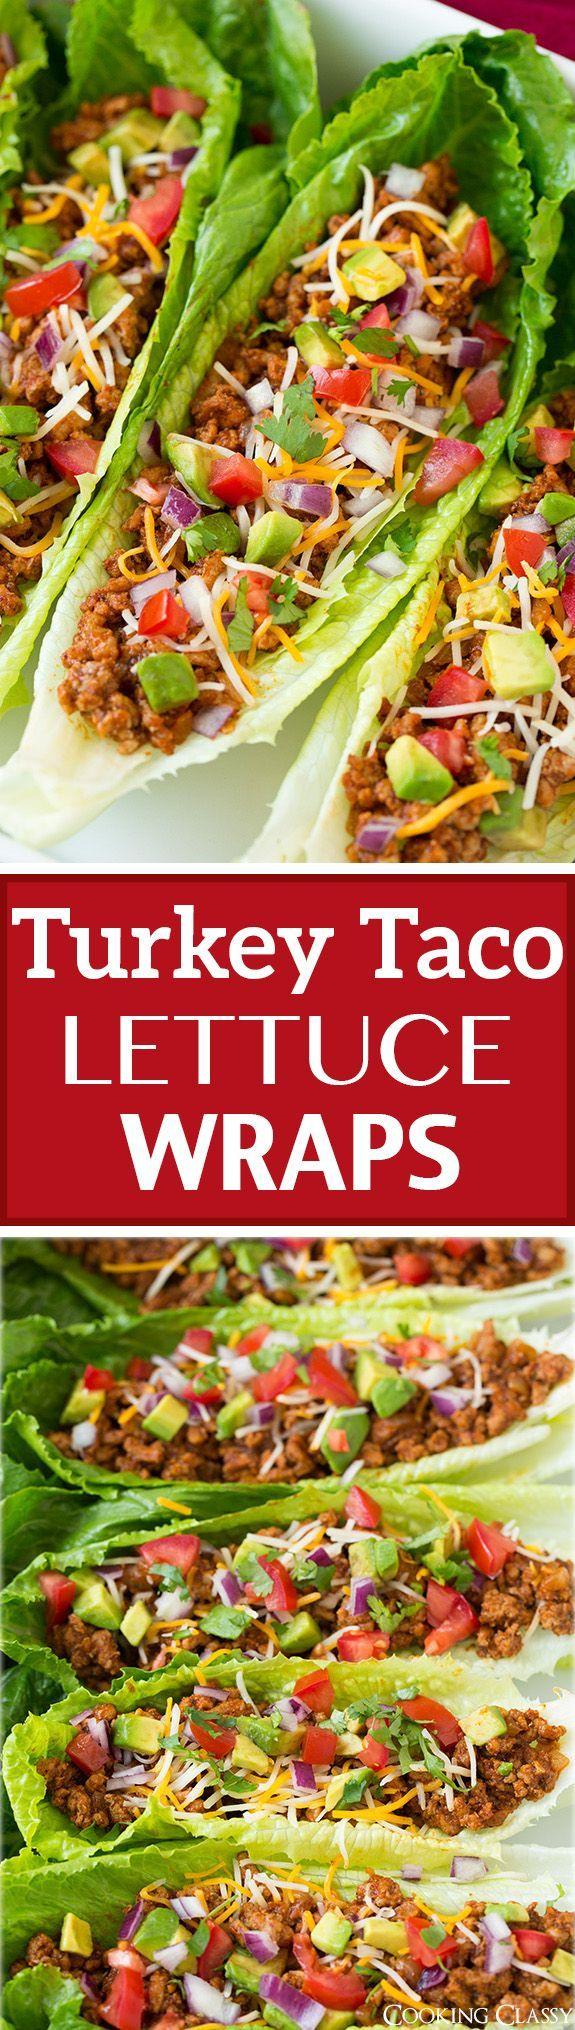 Turkey Taco Lettuce Wraps   Recipe   Tacos, Wraps and Classic